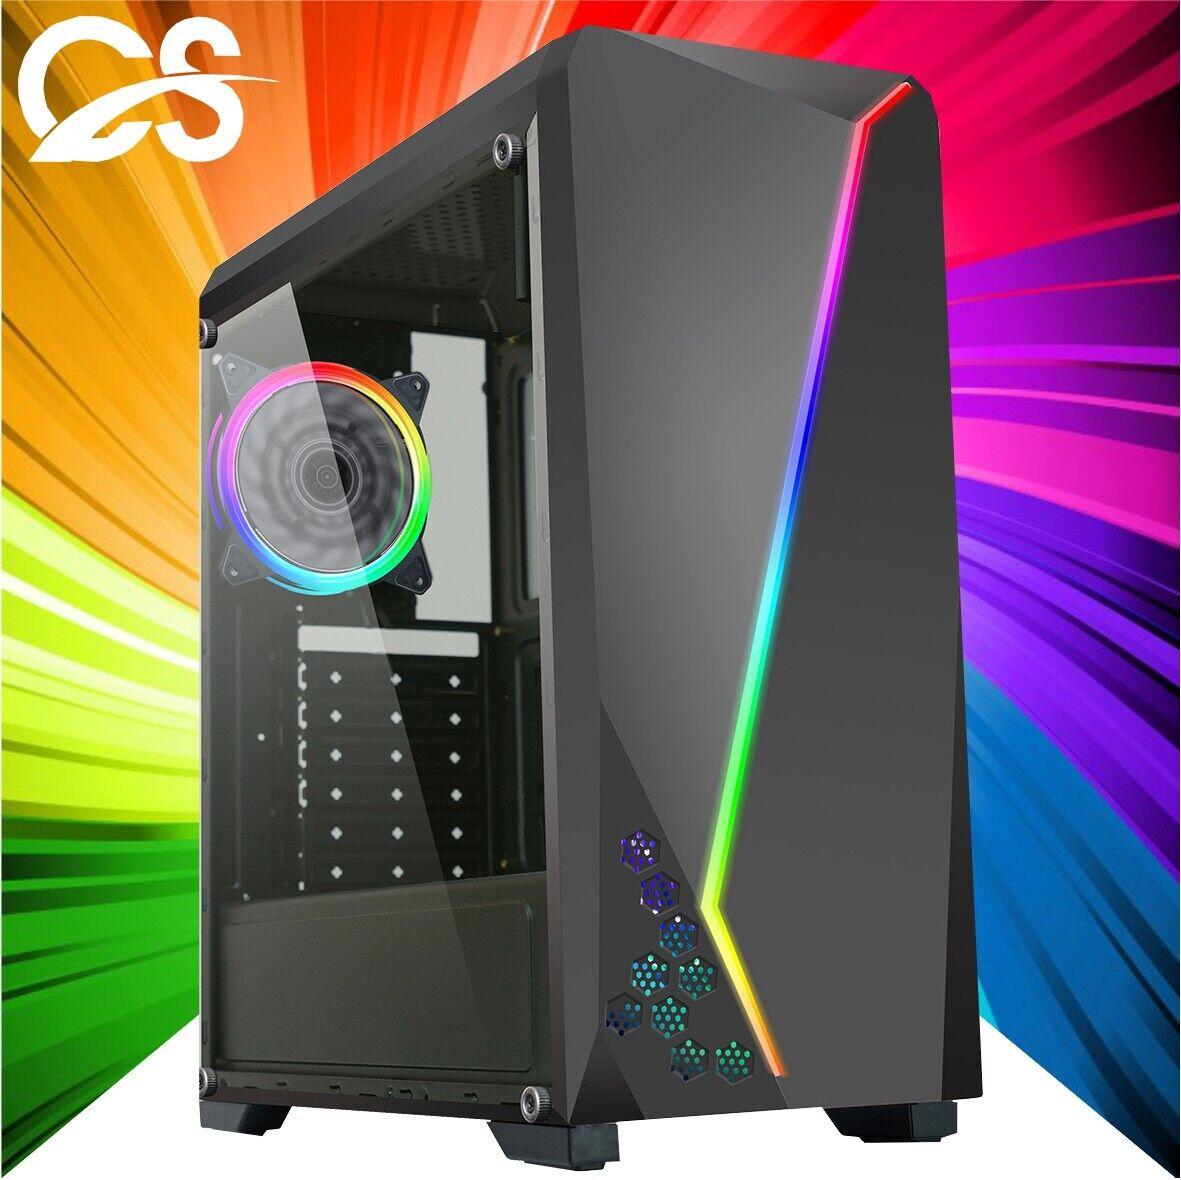 Computer Games - ULTRA FAST Gaming PC Computer Intel Quad Core i7 8GB 1TB Win10 2GB GT710 CHEAP